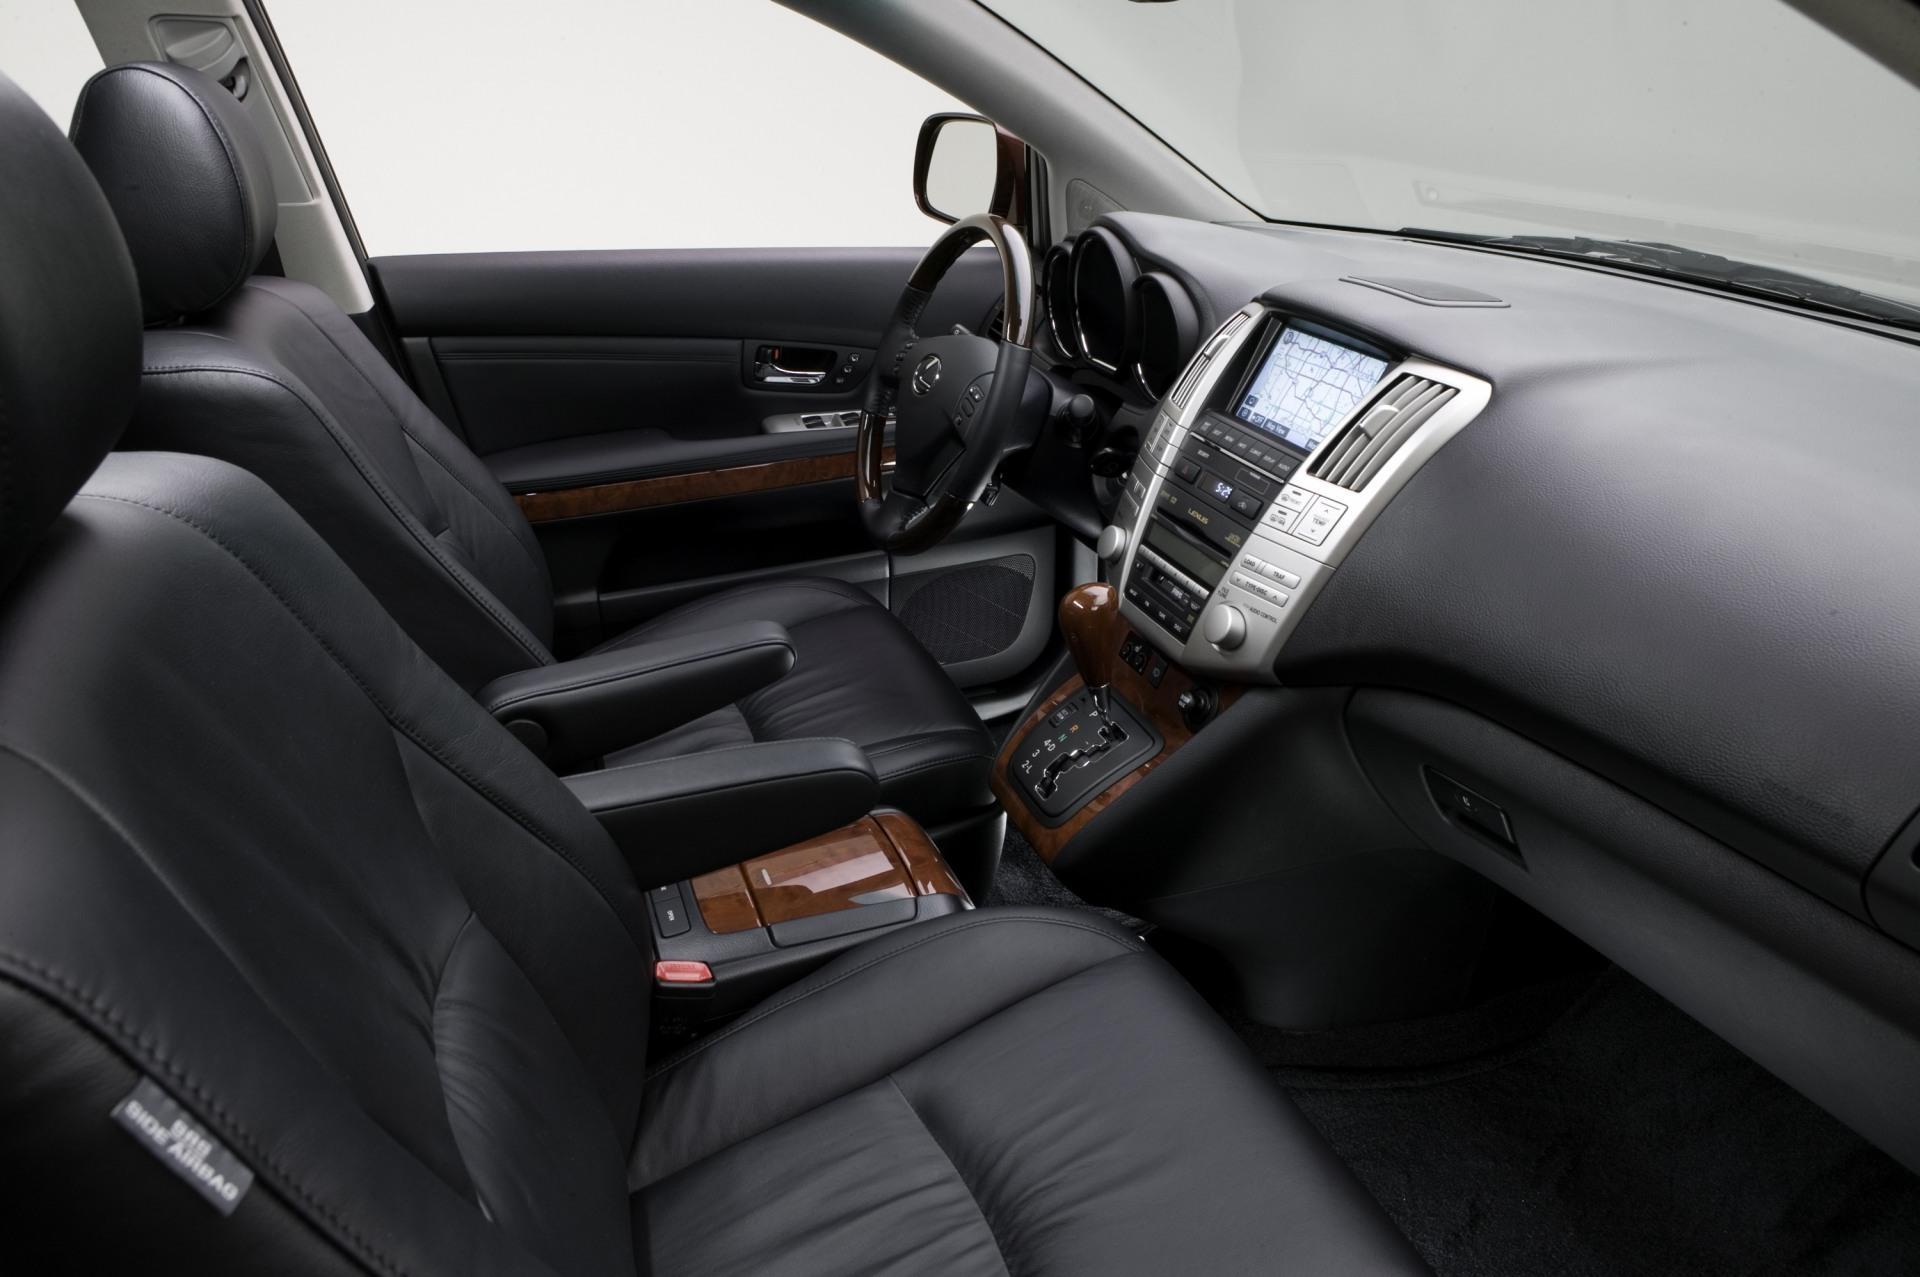 2008 Lexus RX 350 Image